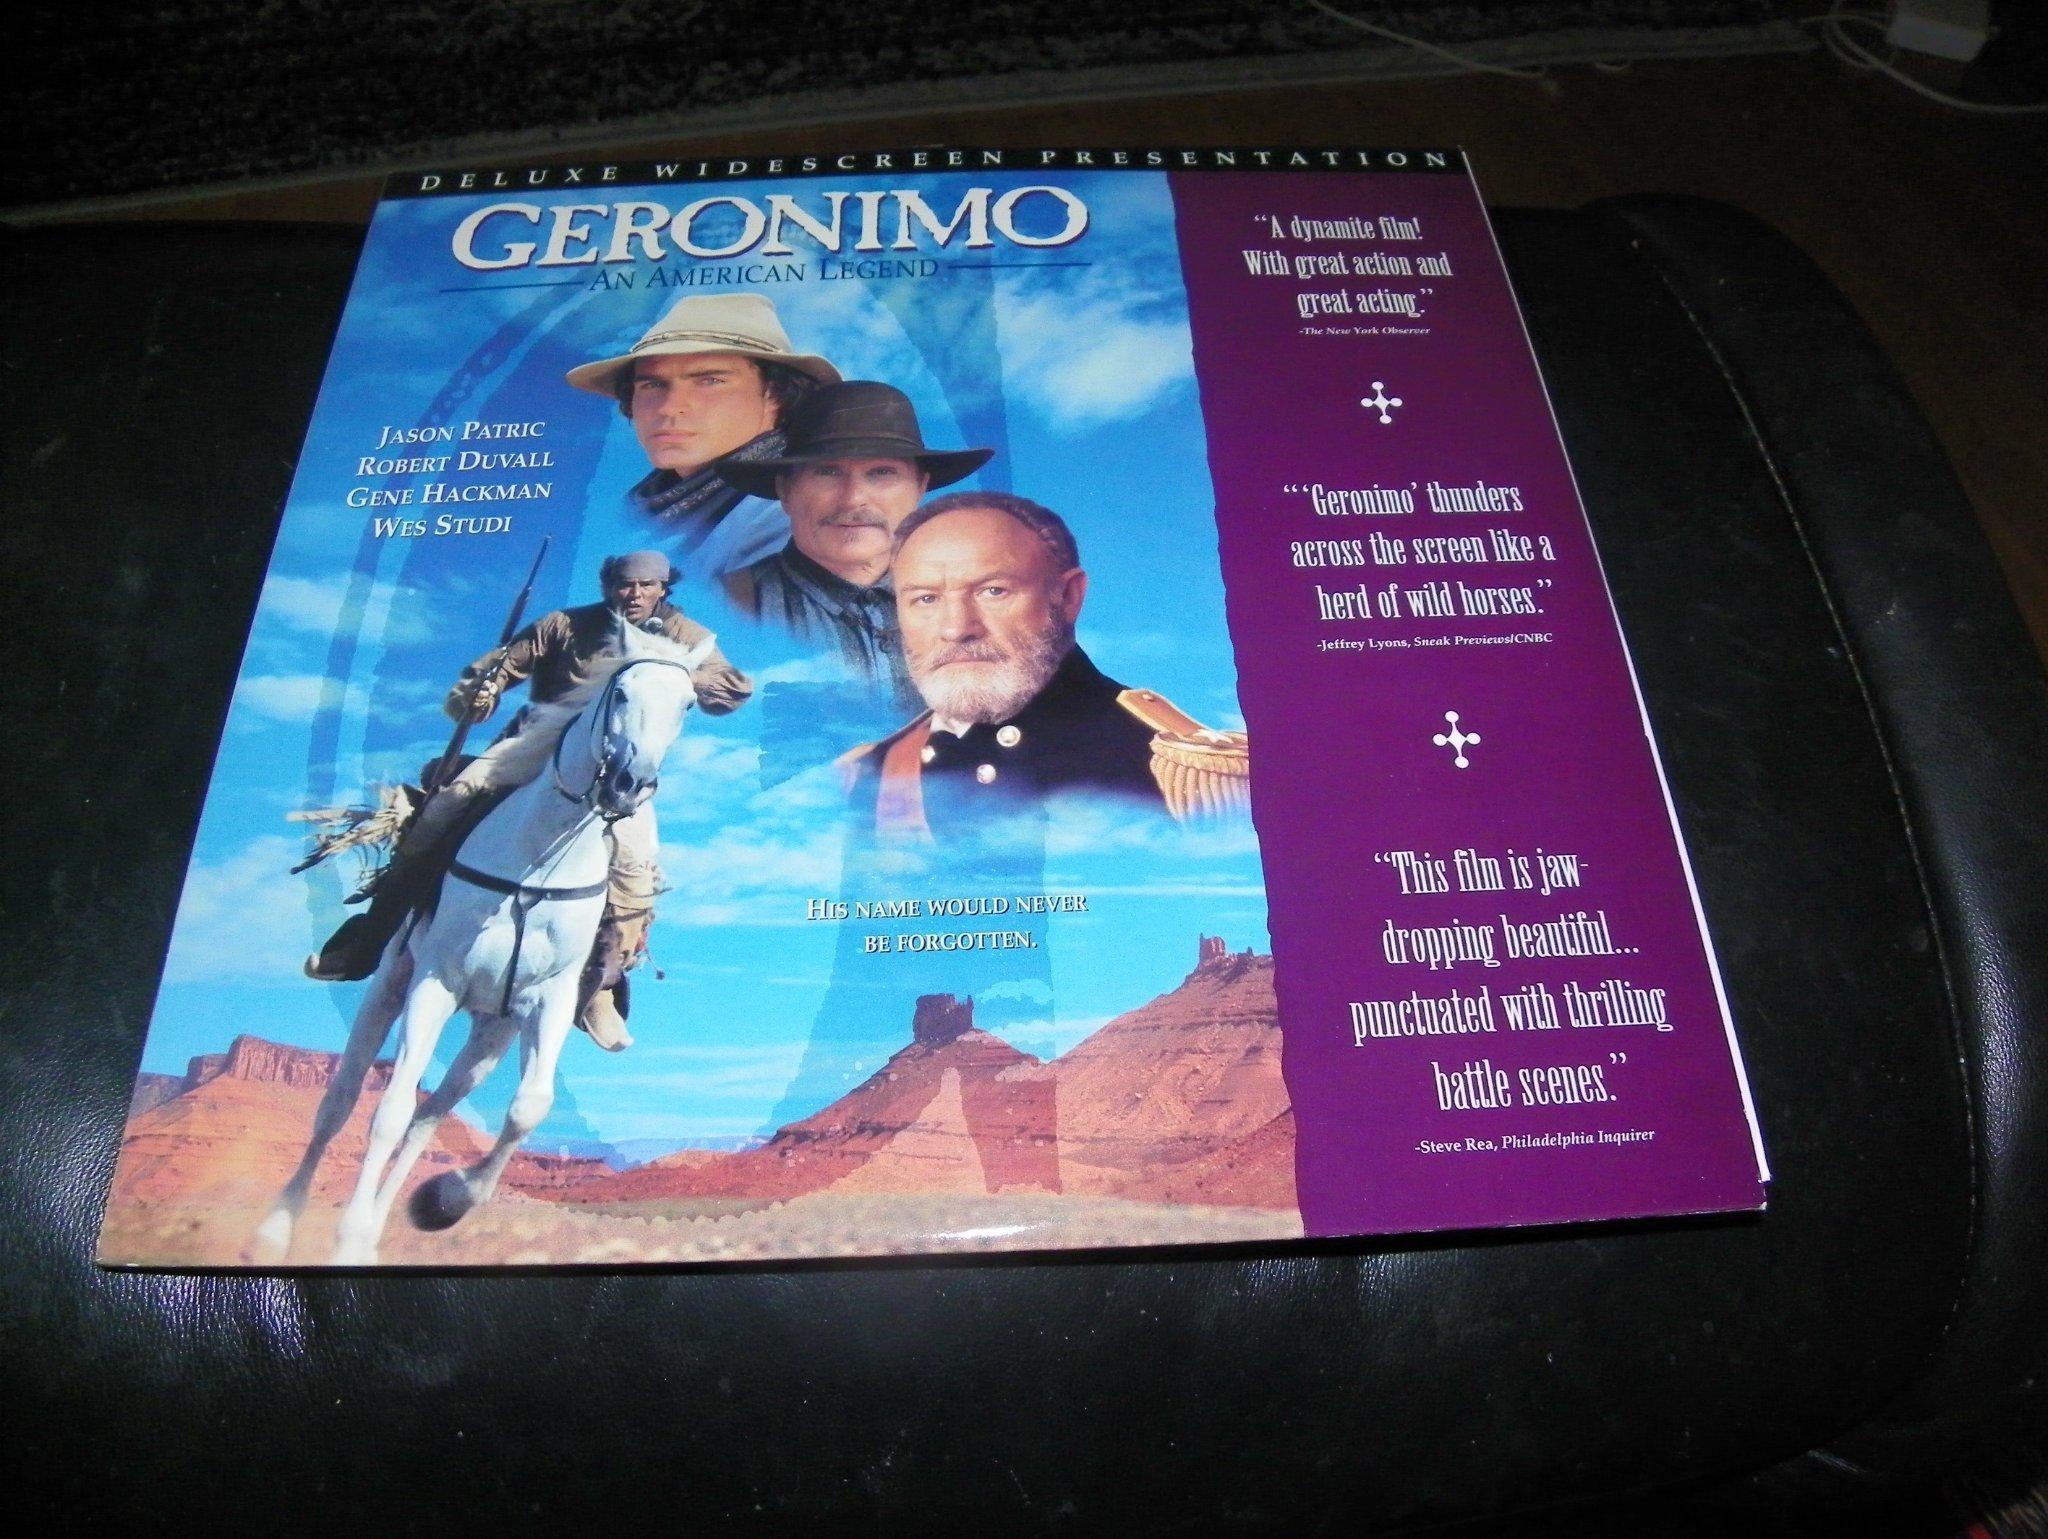 Geronimo Trading Company